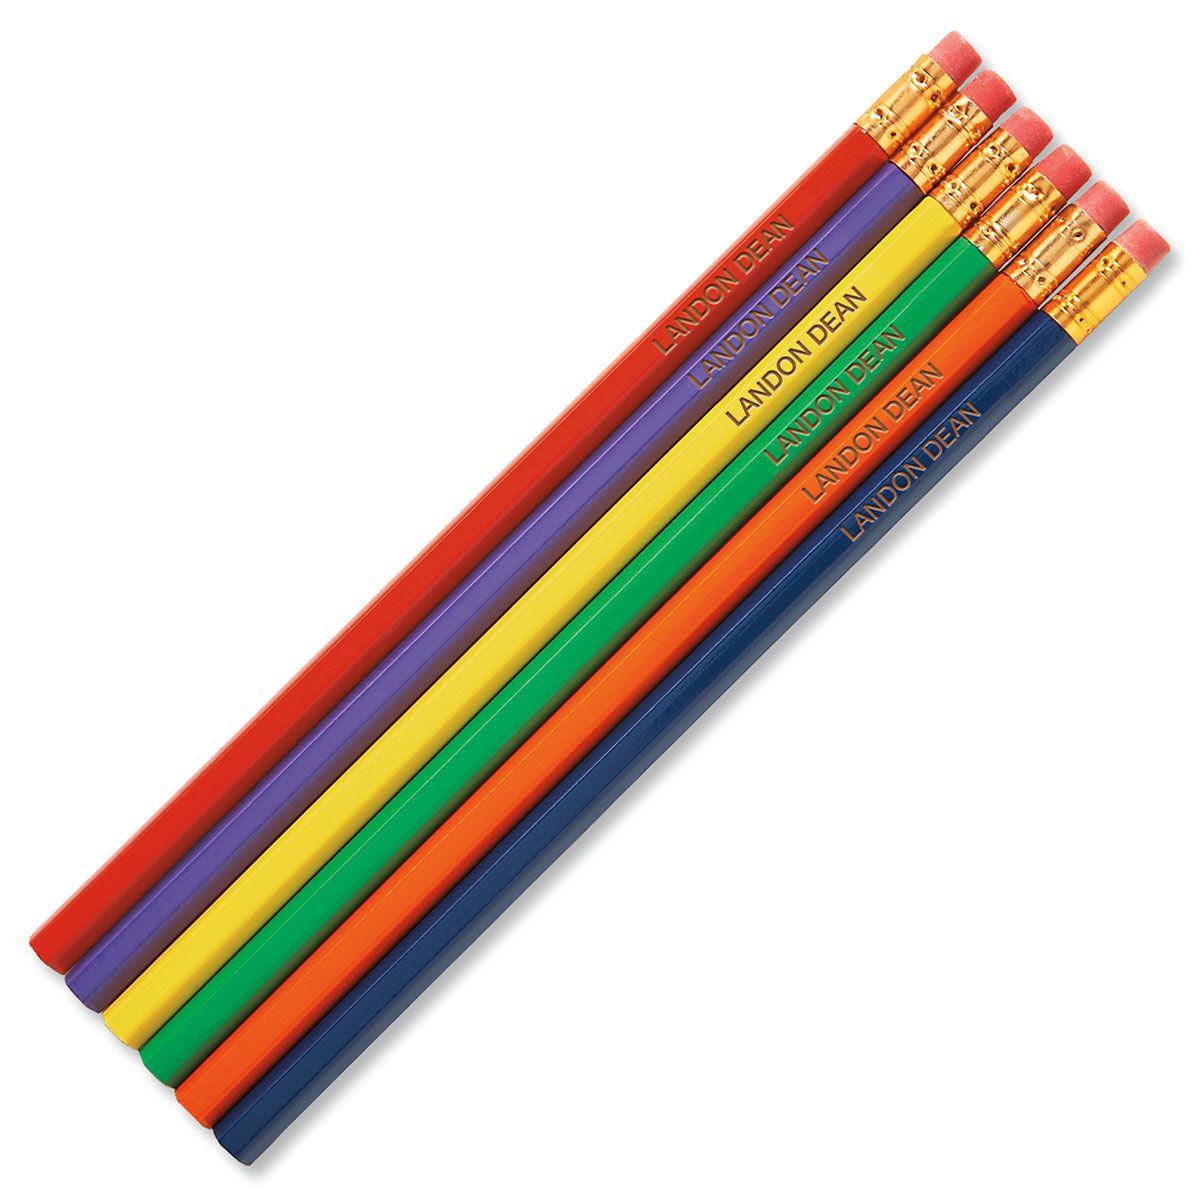 #2 Personalized Hardwood Pencils - Primary